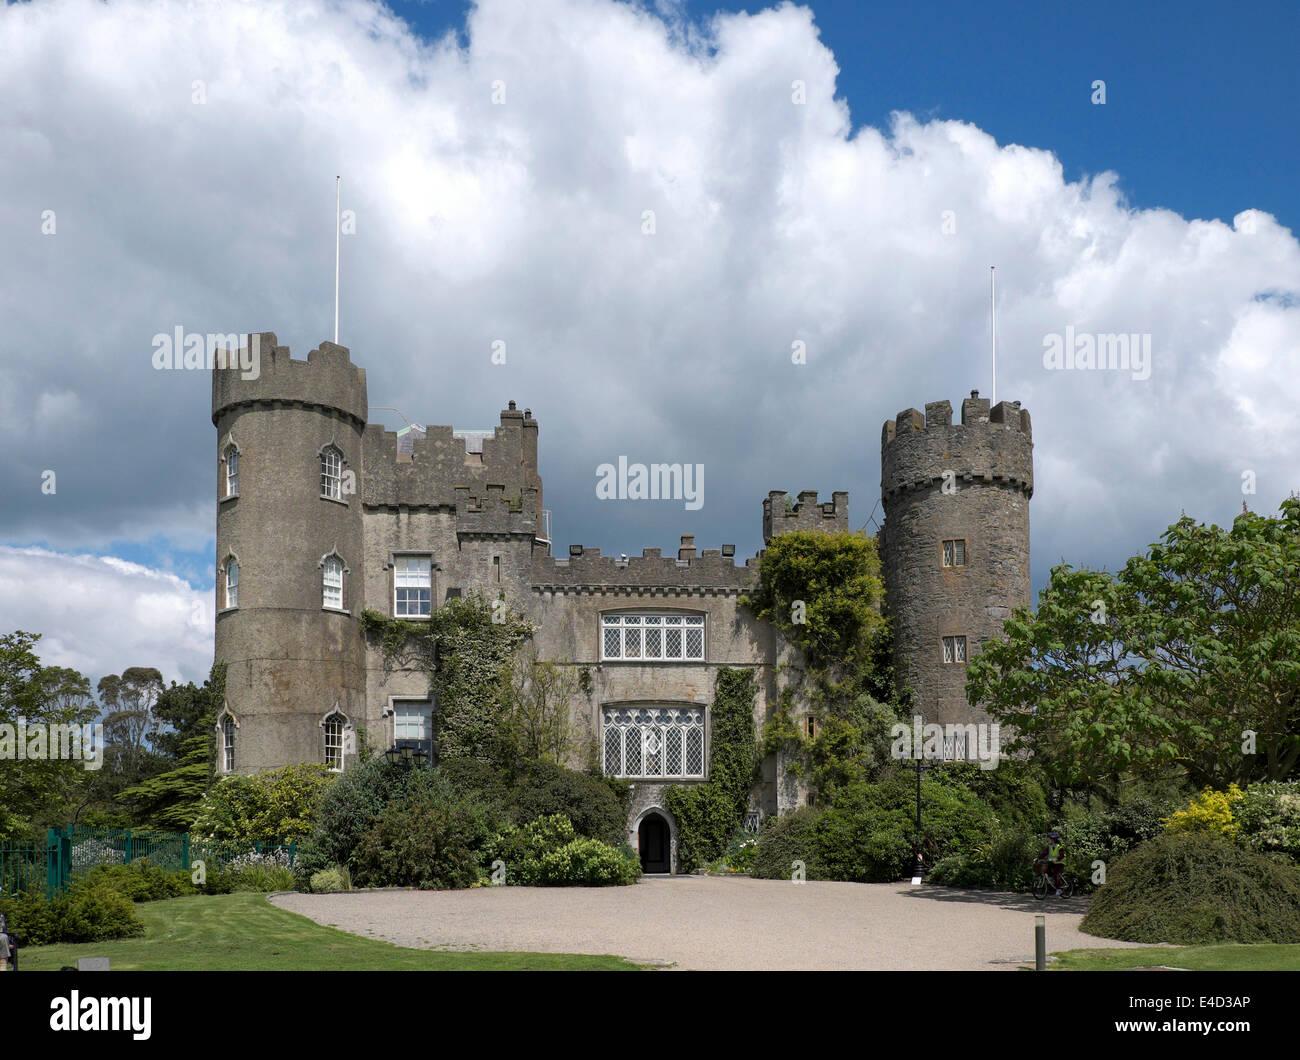 Malahide Castle, County Fingal, Ireland - Stock Image